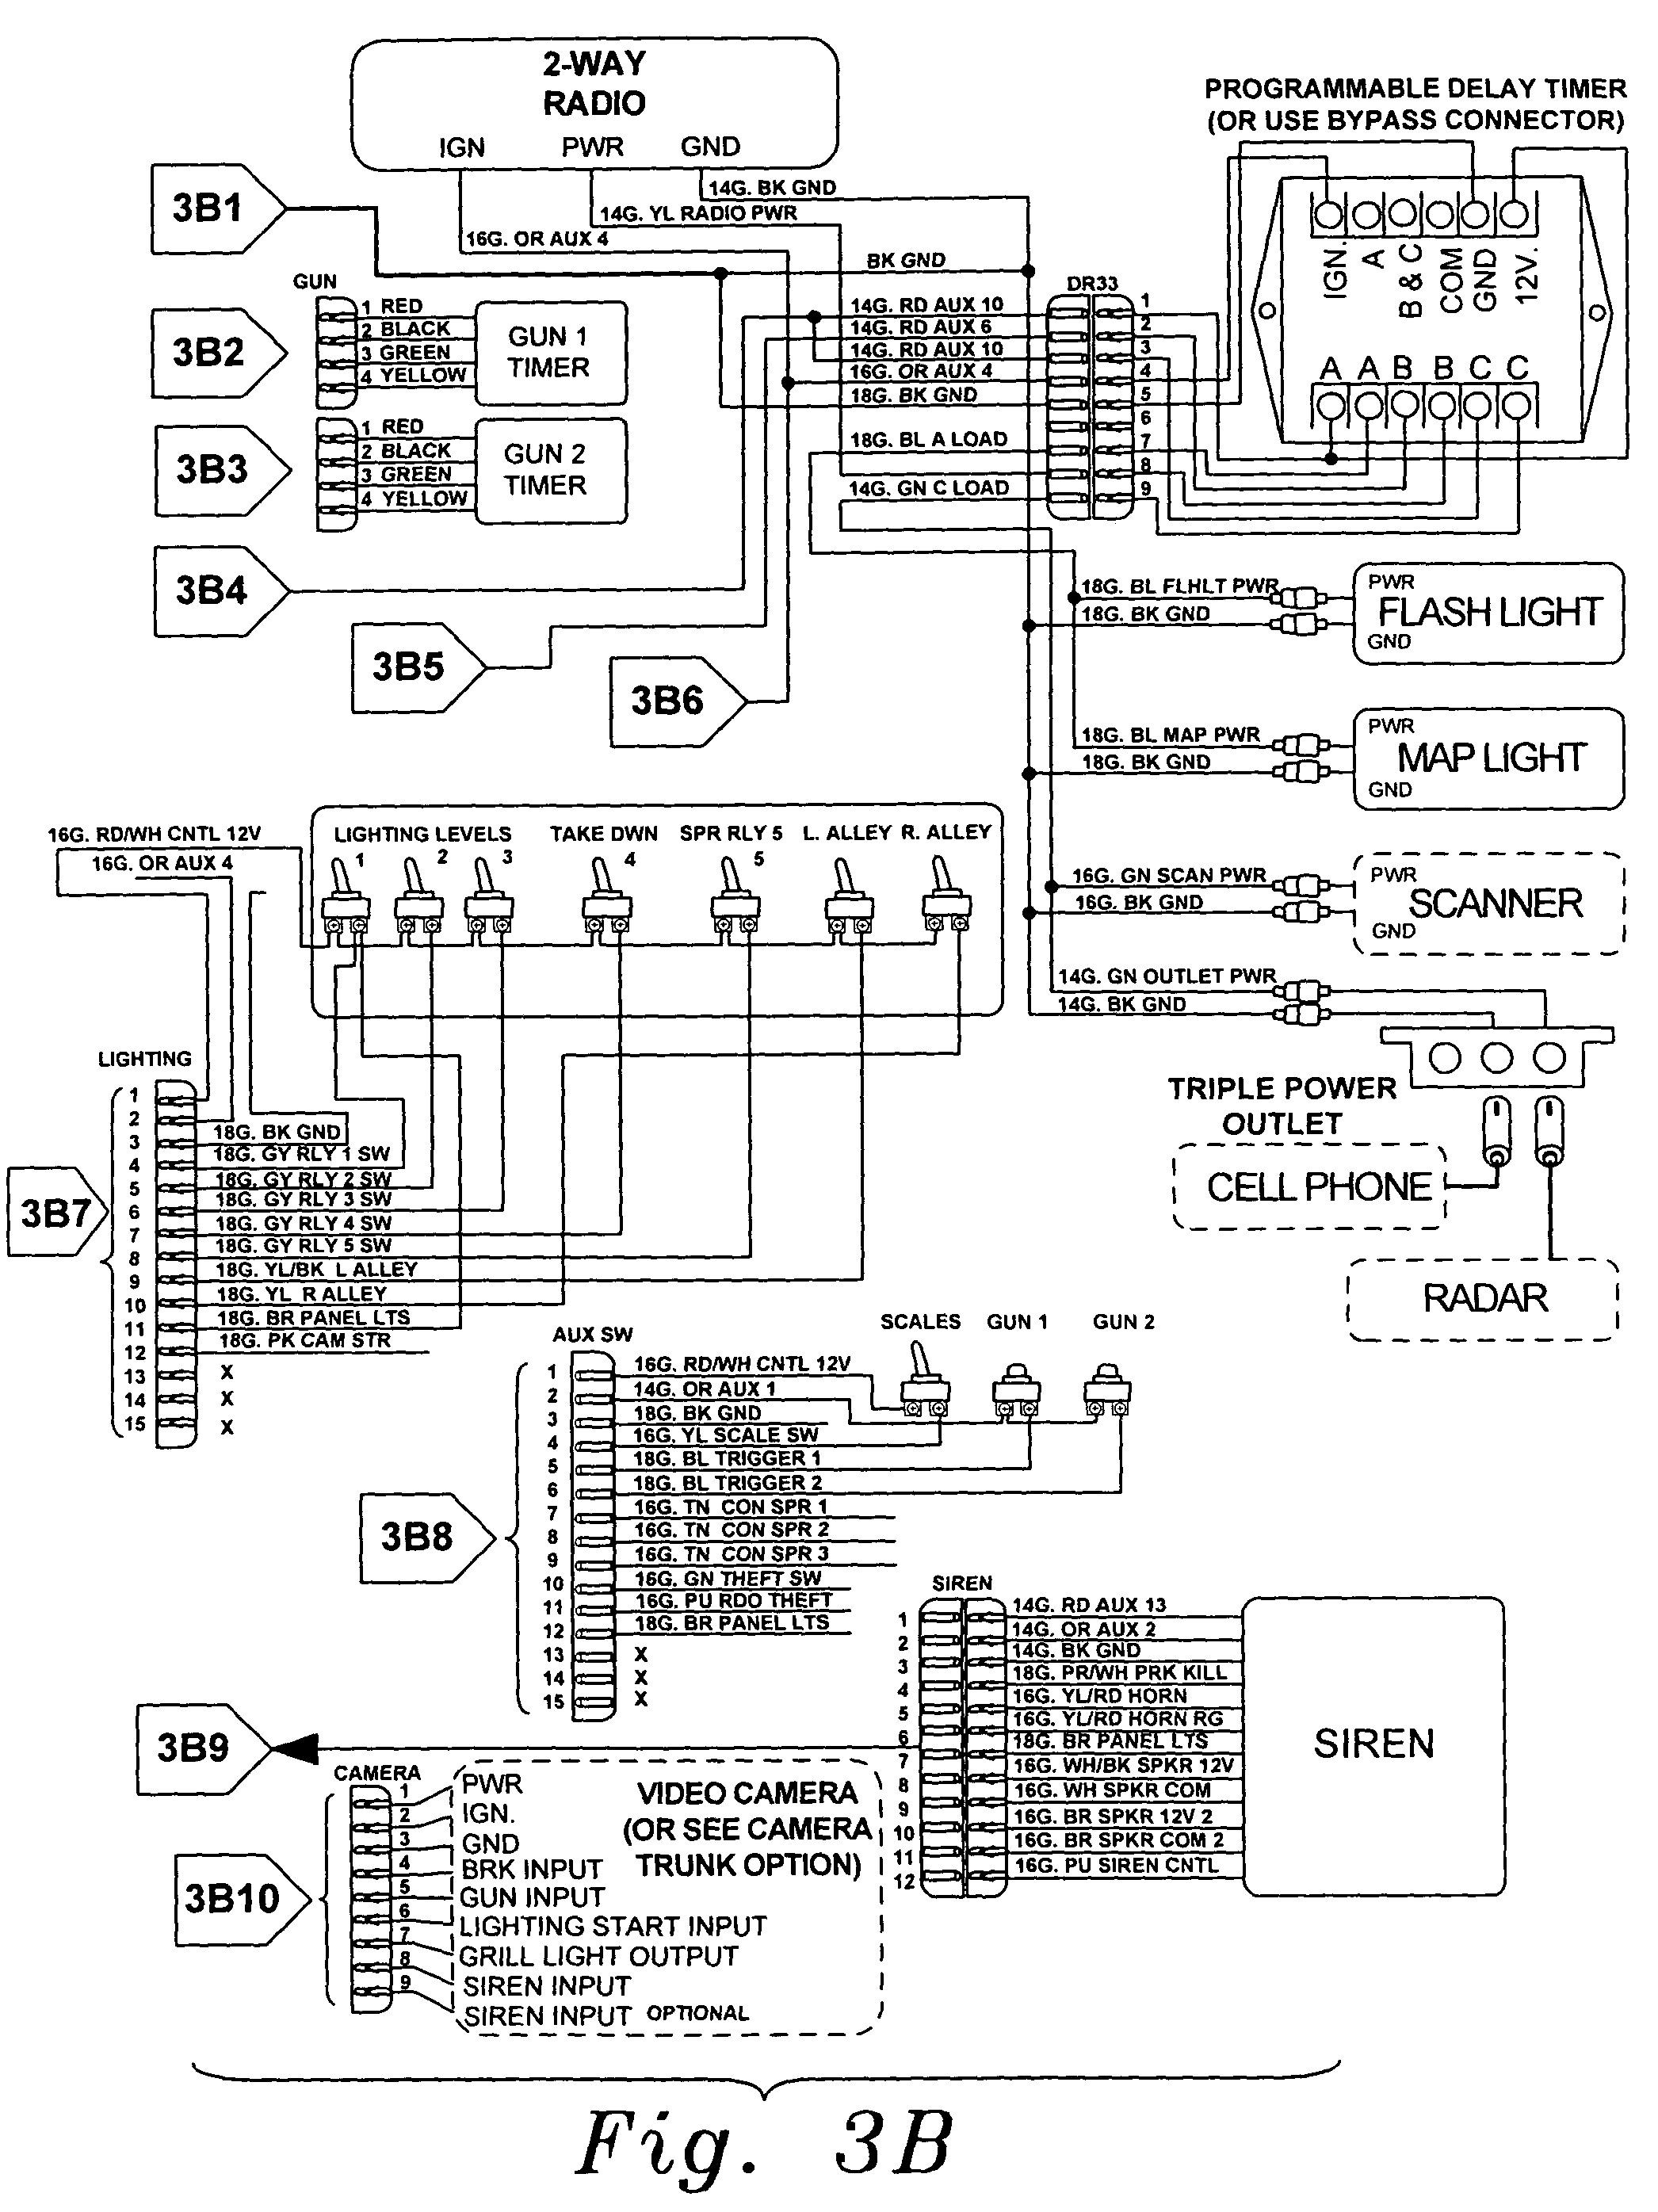 whelen epsilon wiring diagram Download-Whelen Epsilon Wiring Diagram Whelen Led Lightbar Wiring Diagram Wiring 15-e